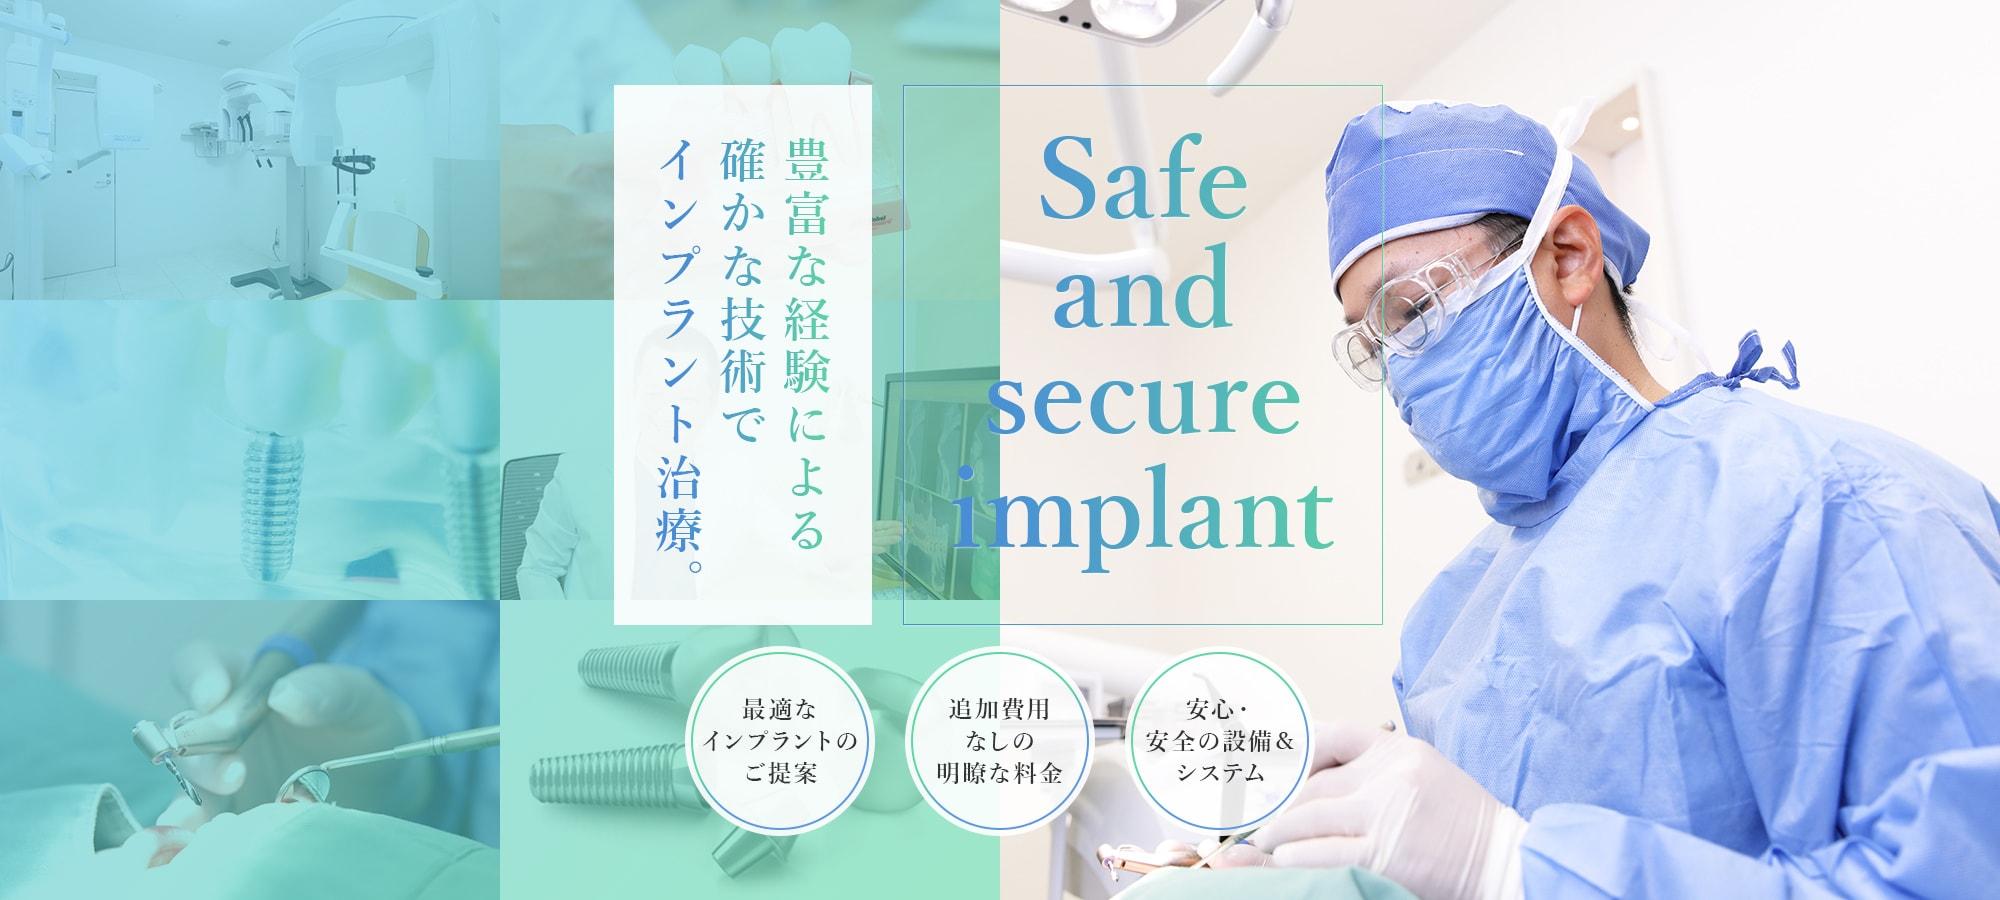 Safe and secure implant 豊富な経験による確かな技術でインプラント治療